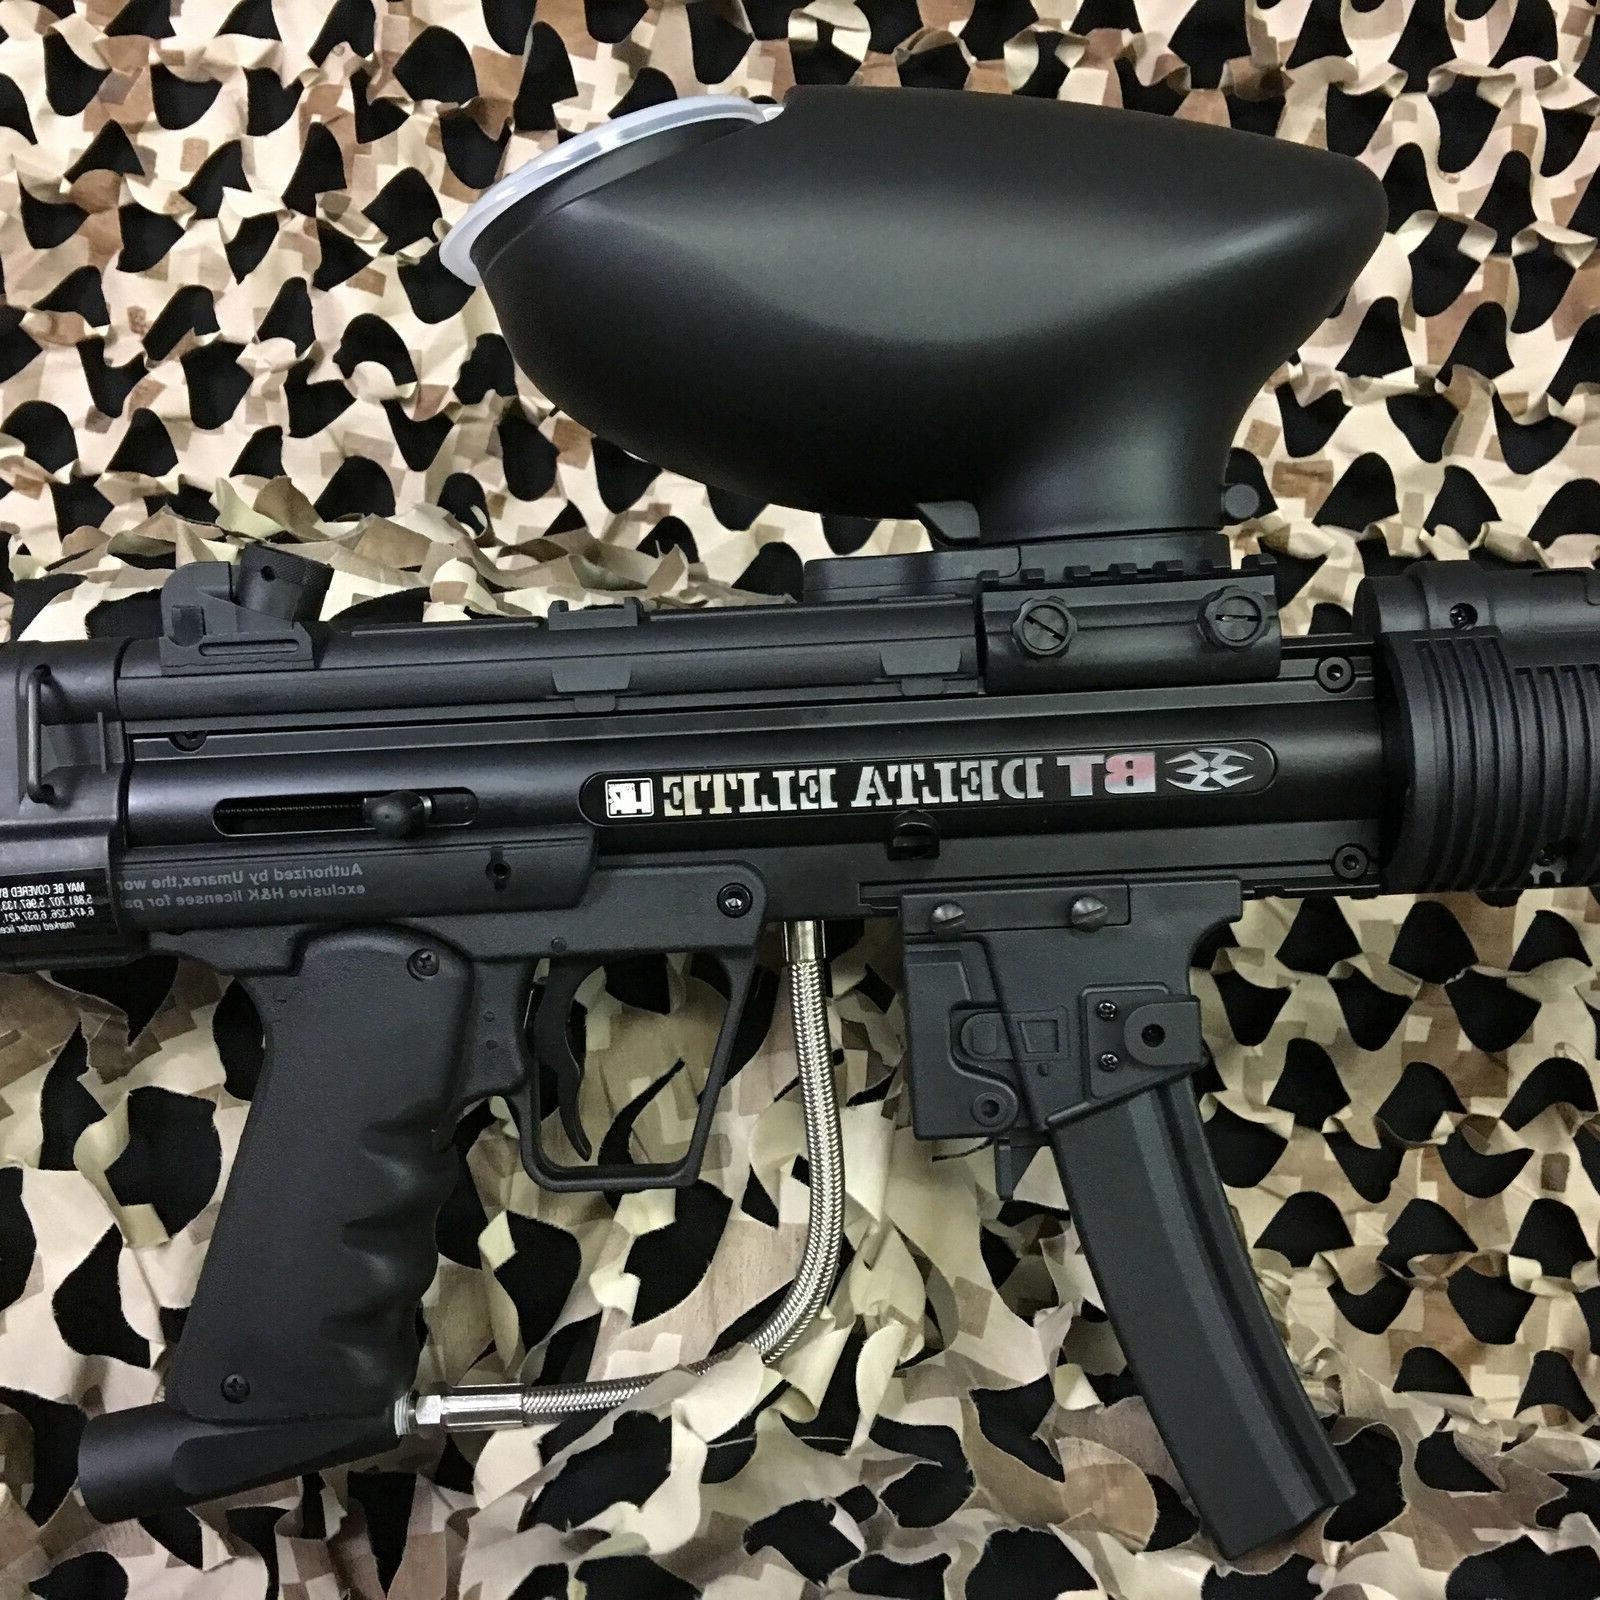 NEW BT-4 ELITE Electronic Tactical Gun